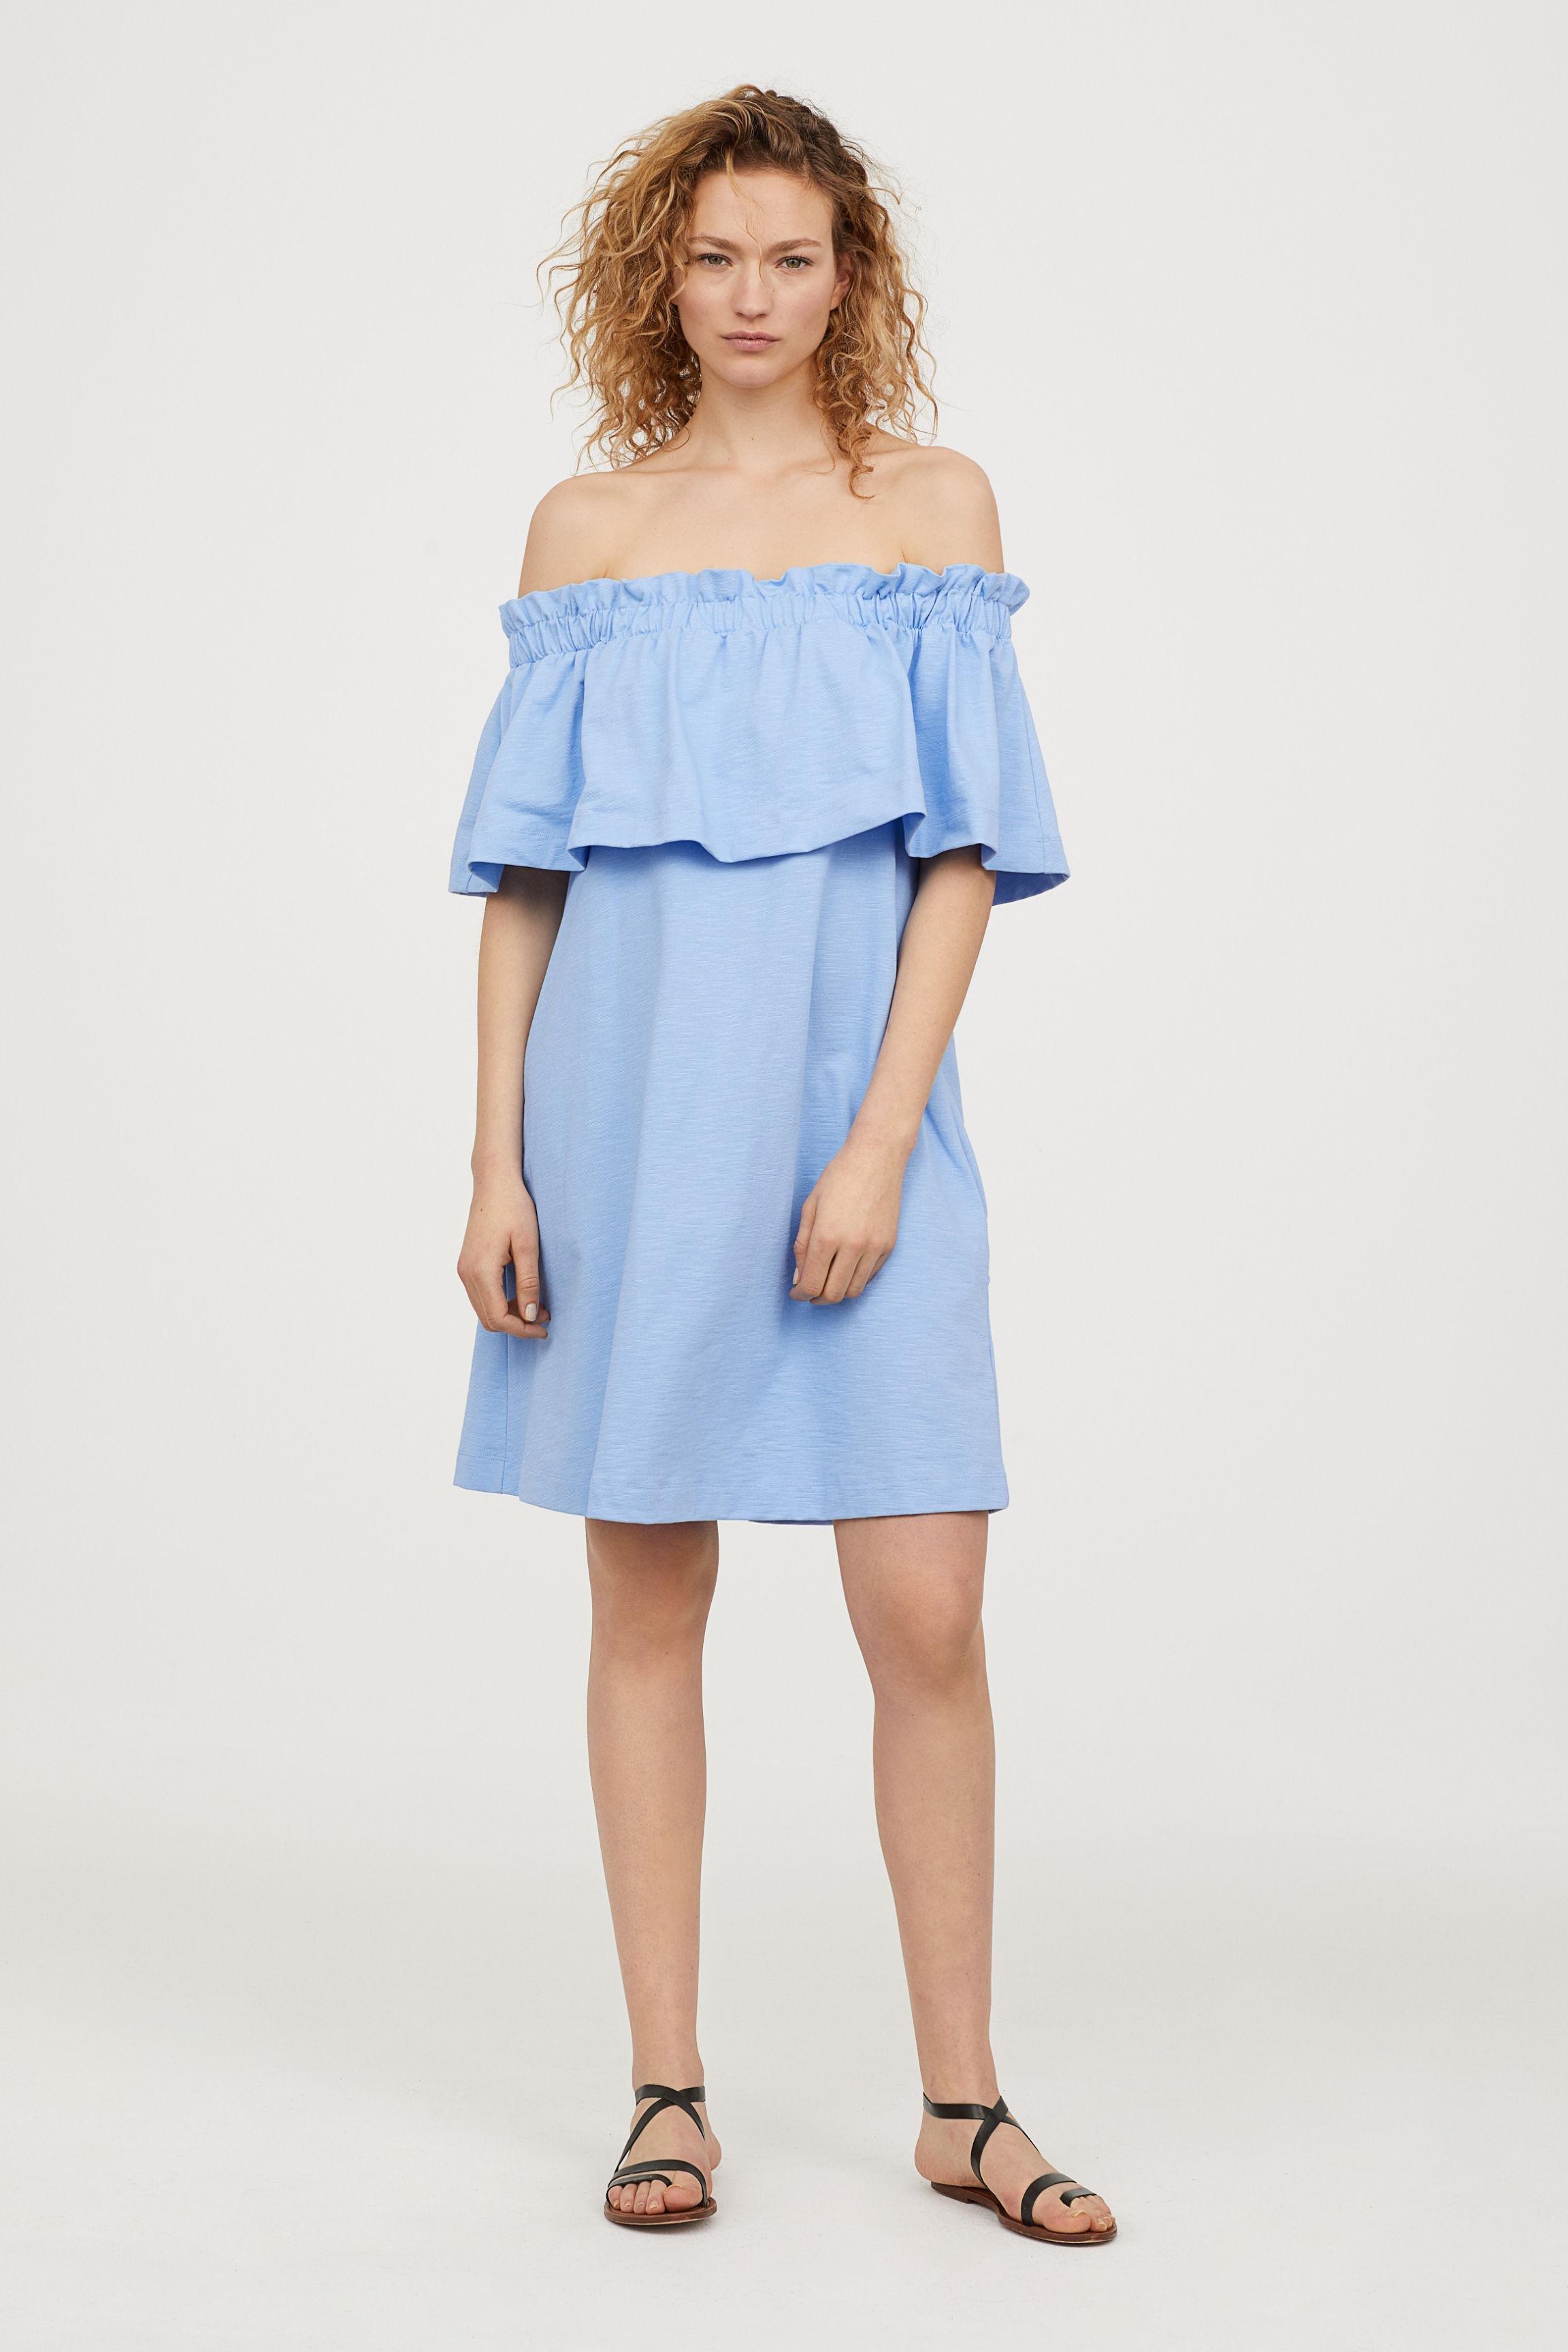 68479acb3c49 Gallery. Women s Tropical Print Dresses ...